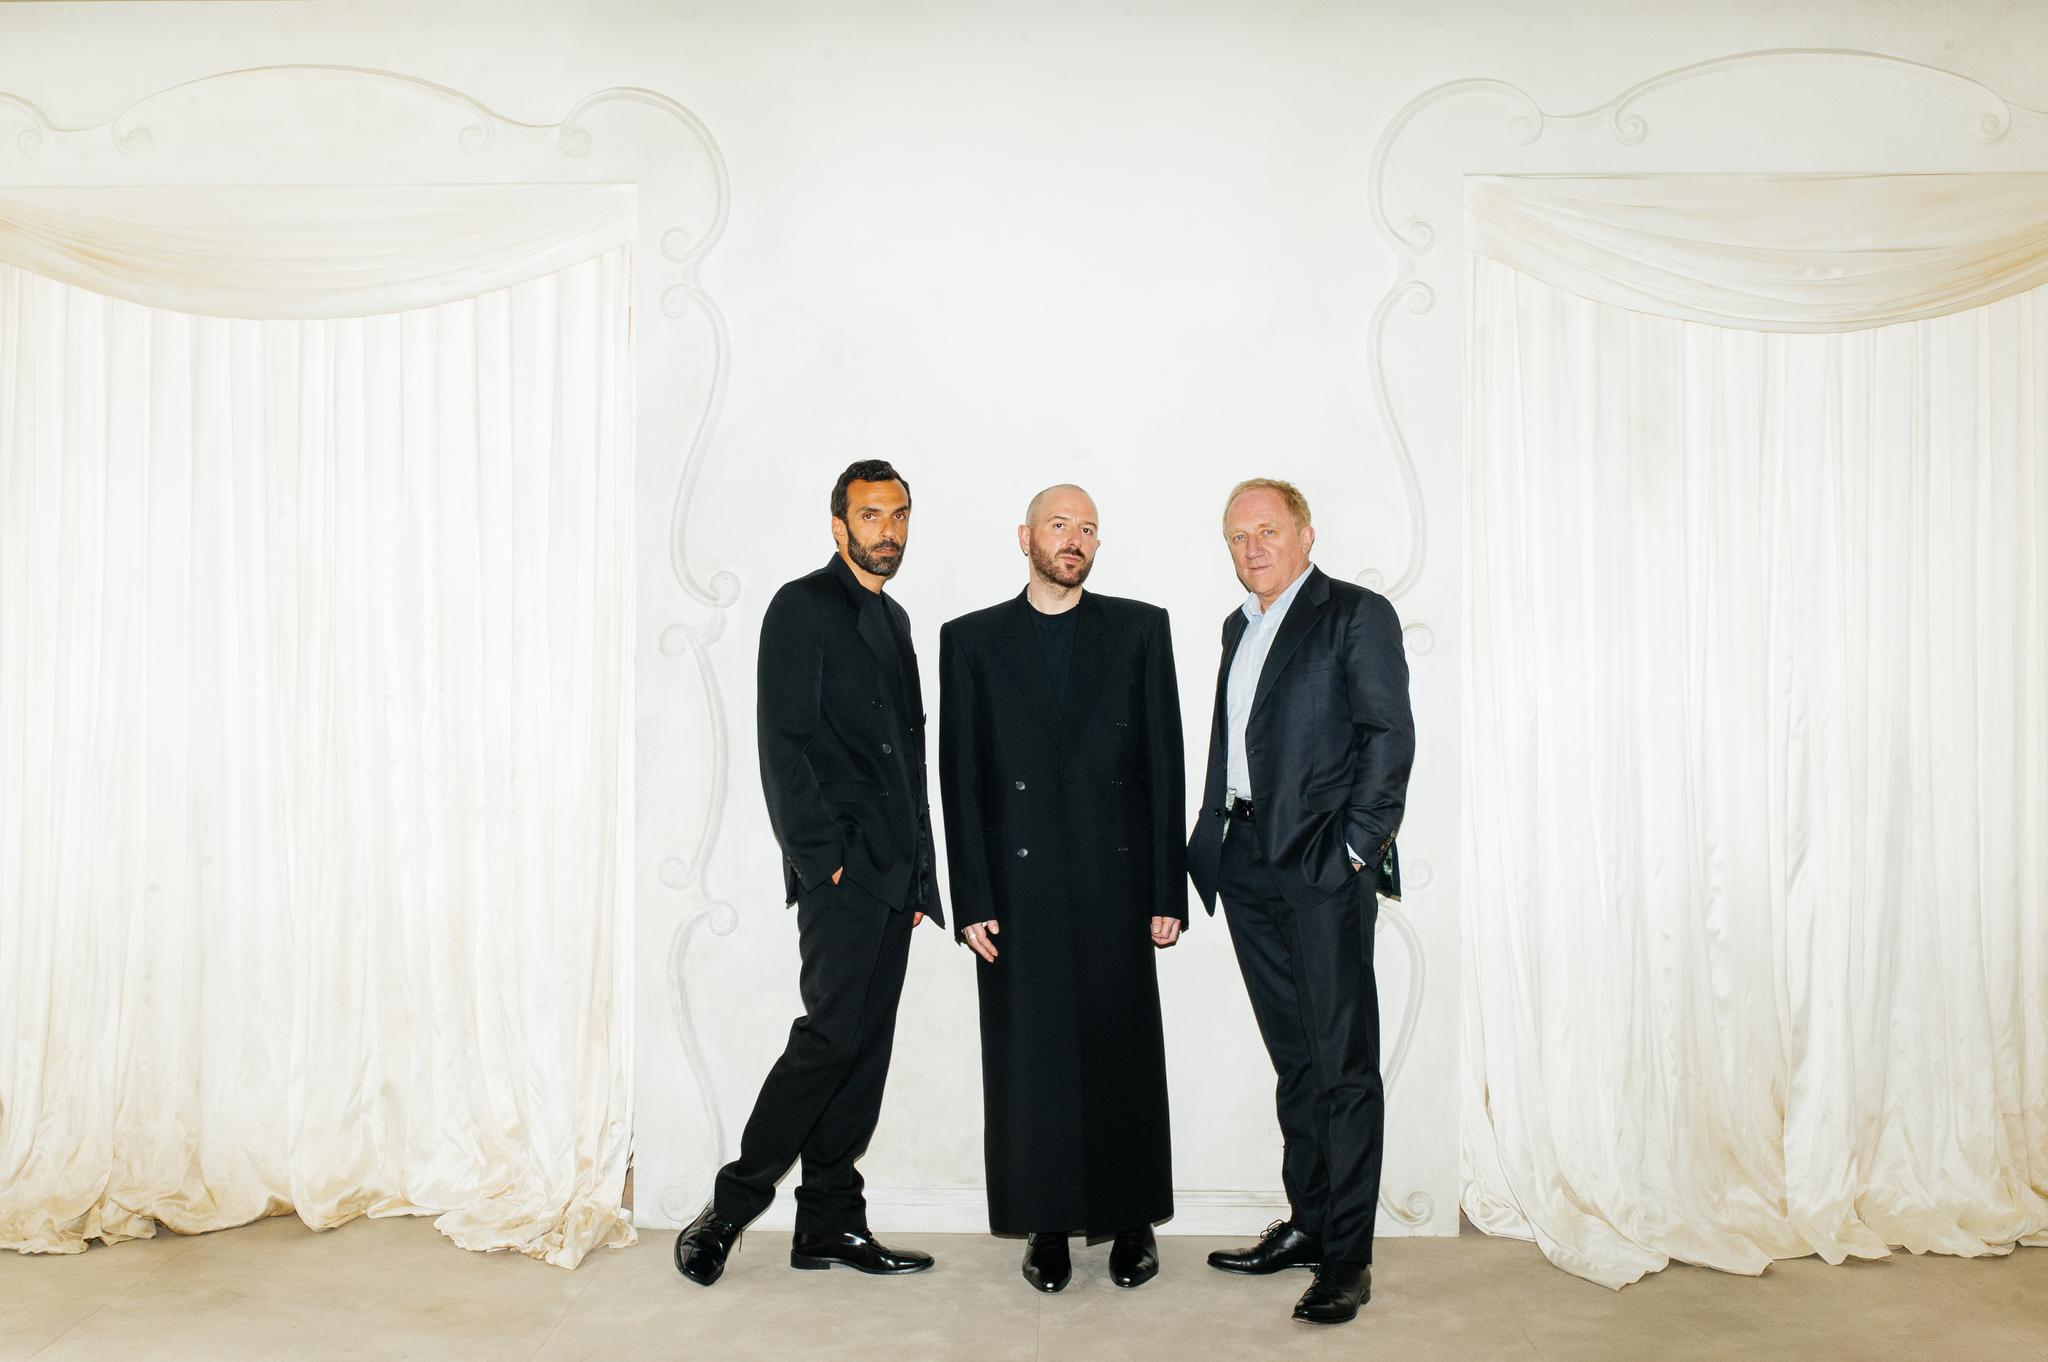 Cédric Charbit, Demna Gvasalia and François-Henri Pinault.